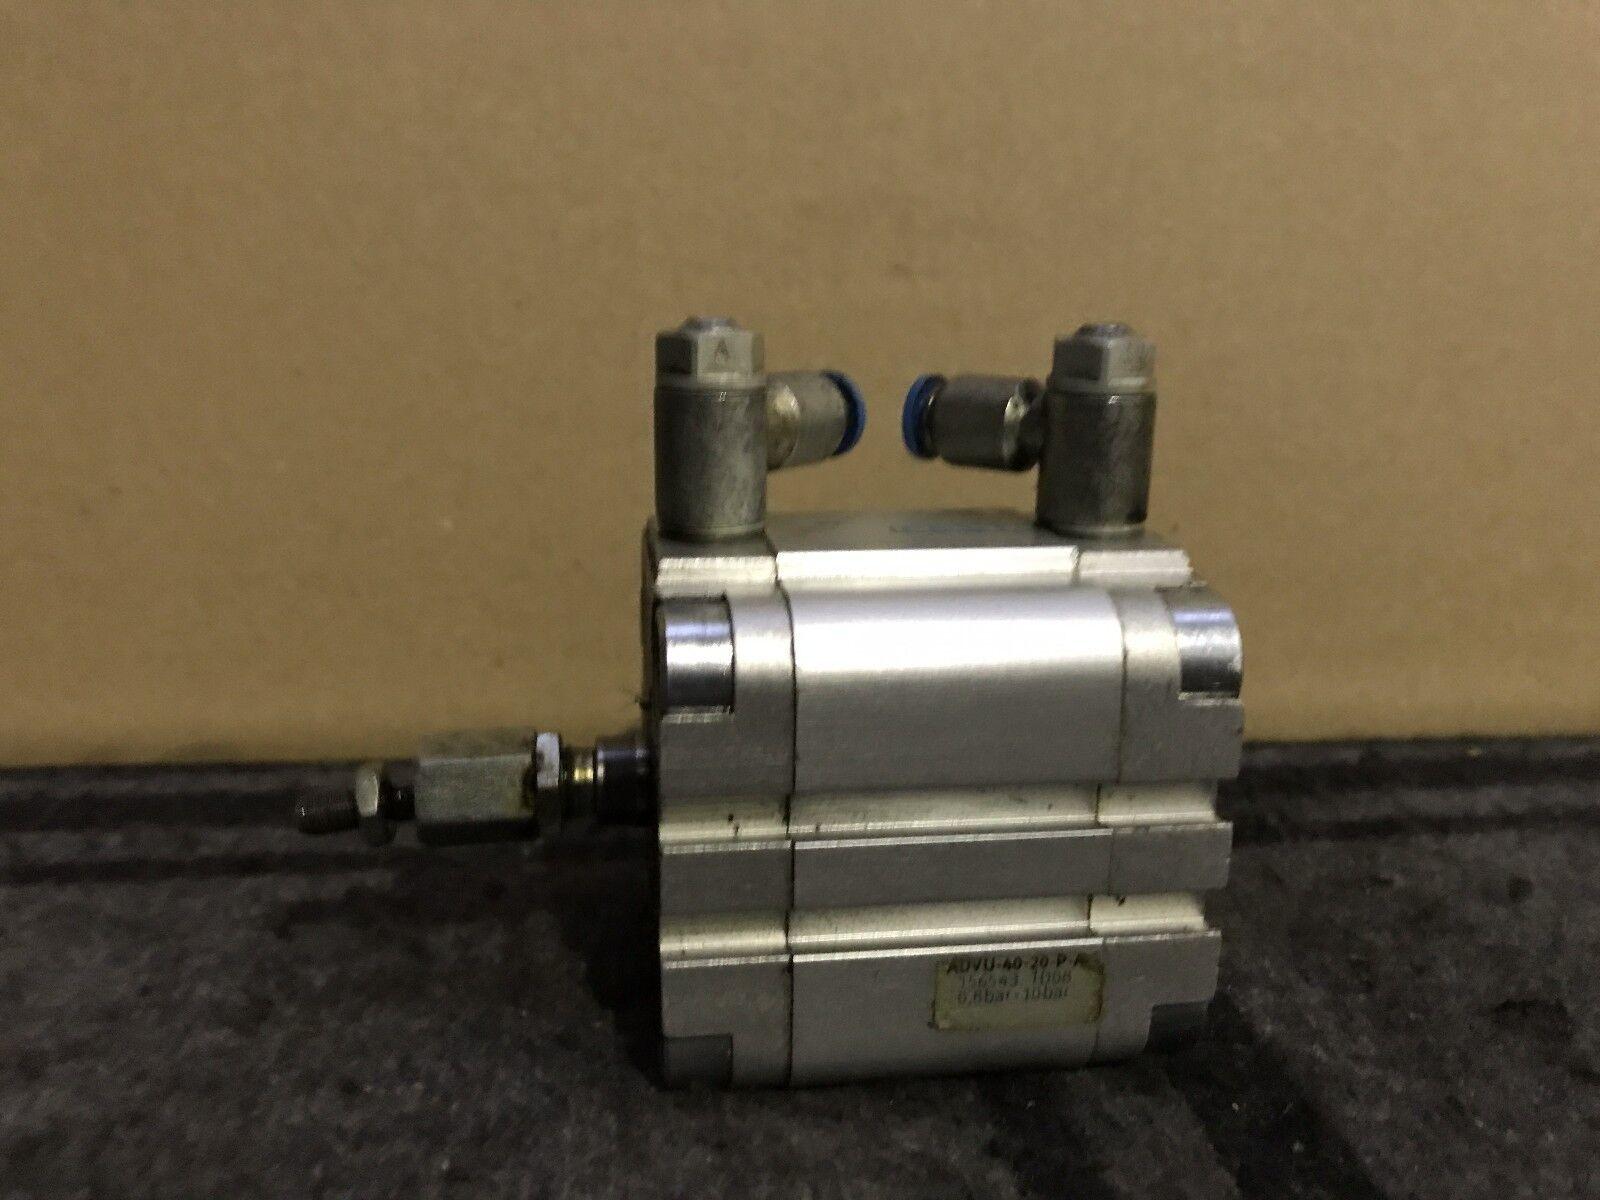 FESTO ADVU-40-20-P-A / cylinder 156543 Kompaktzylinder, short stroke cylinder / e7e7aa